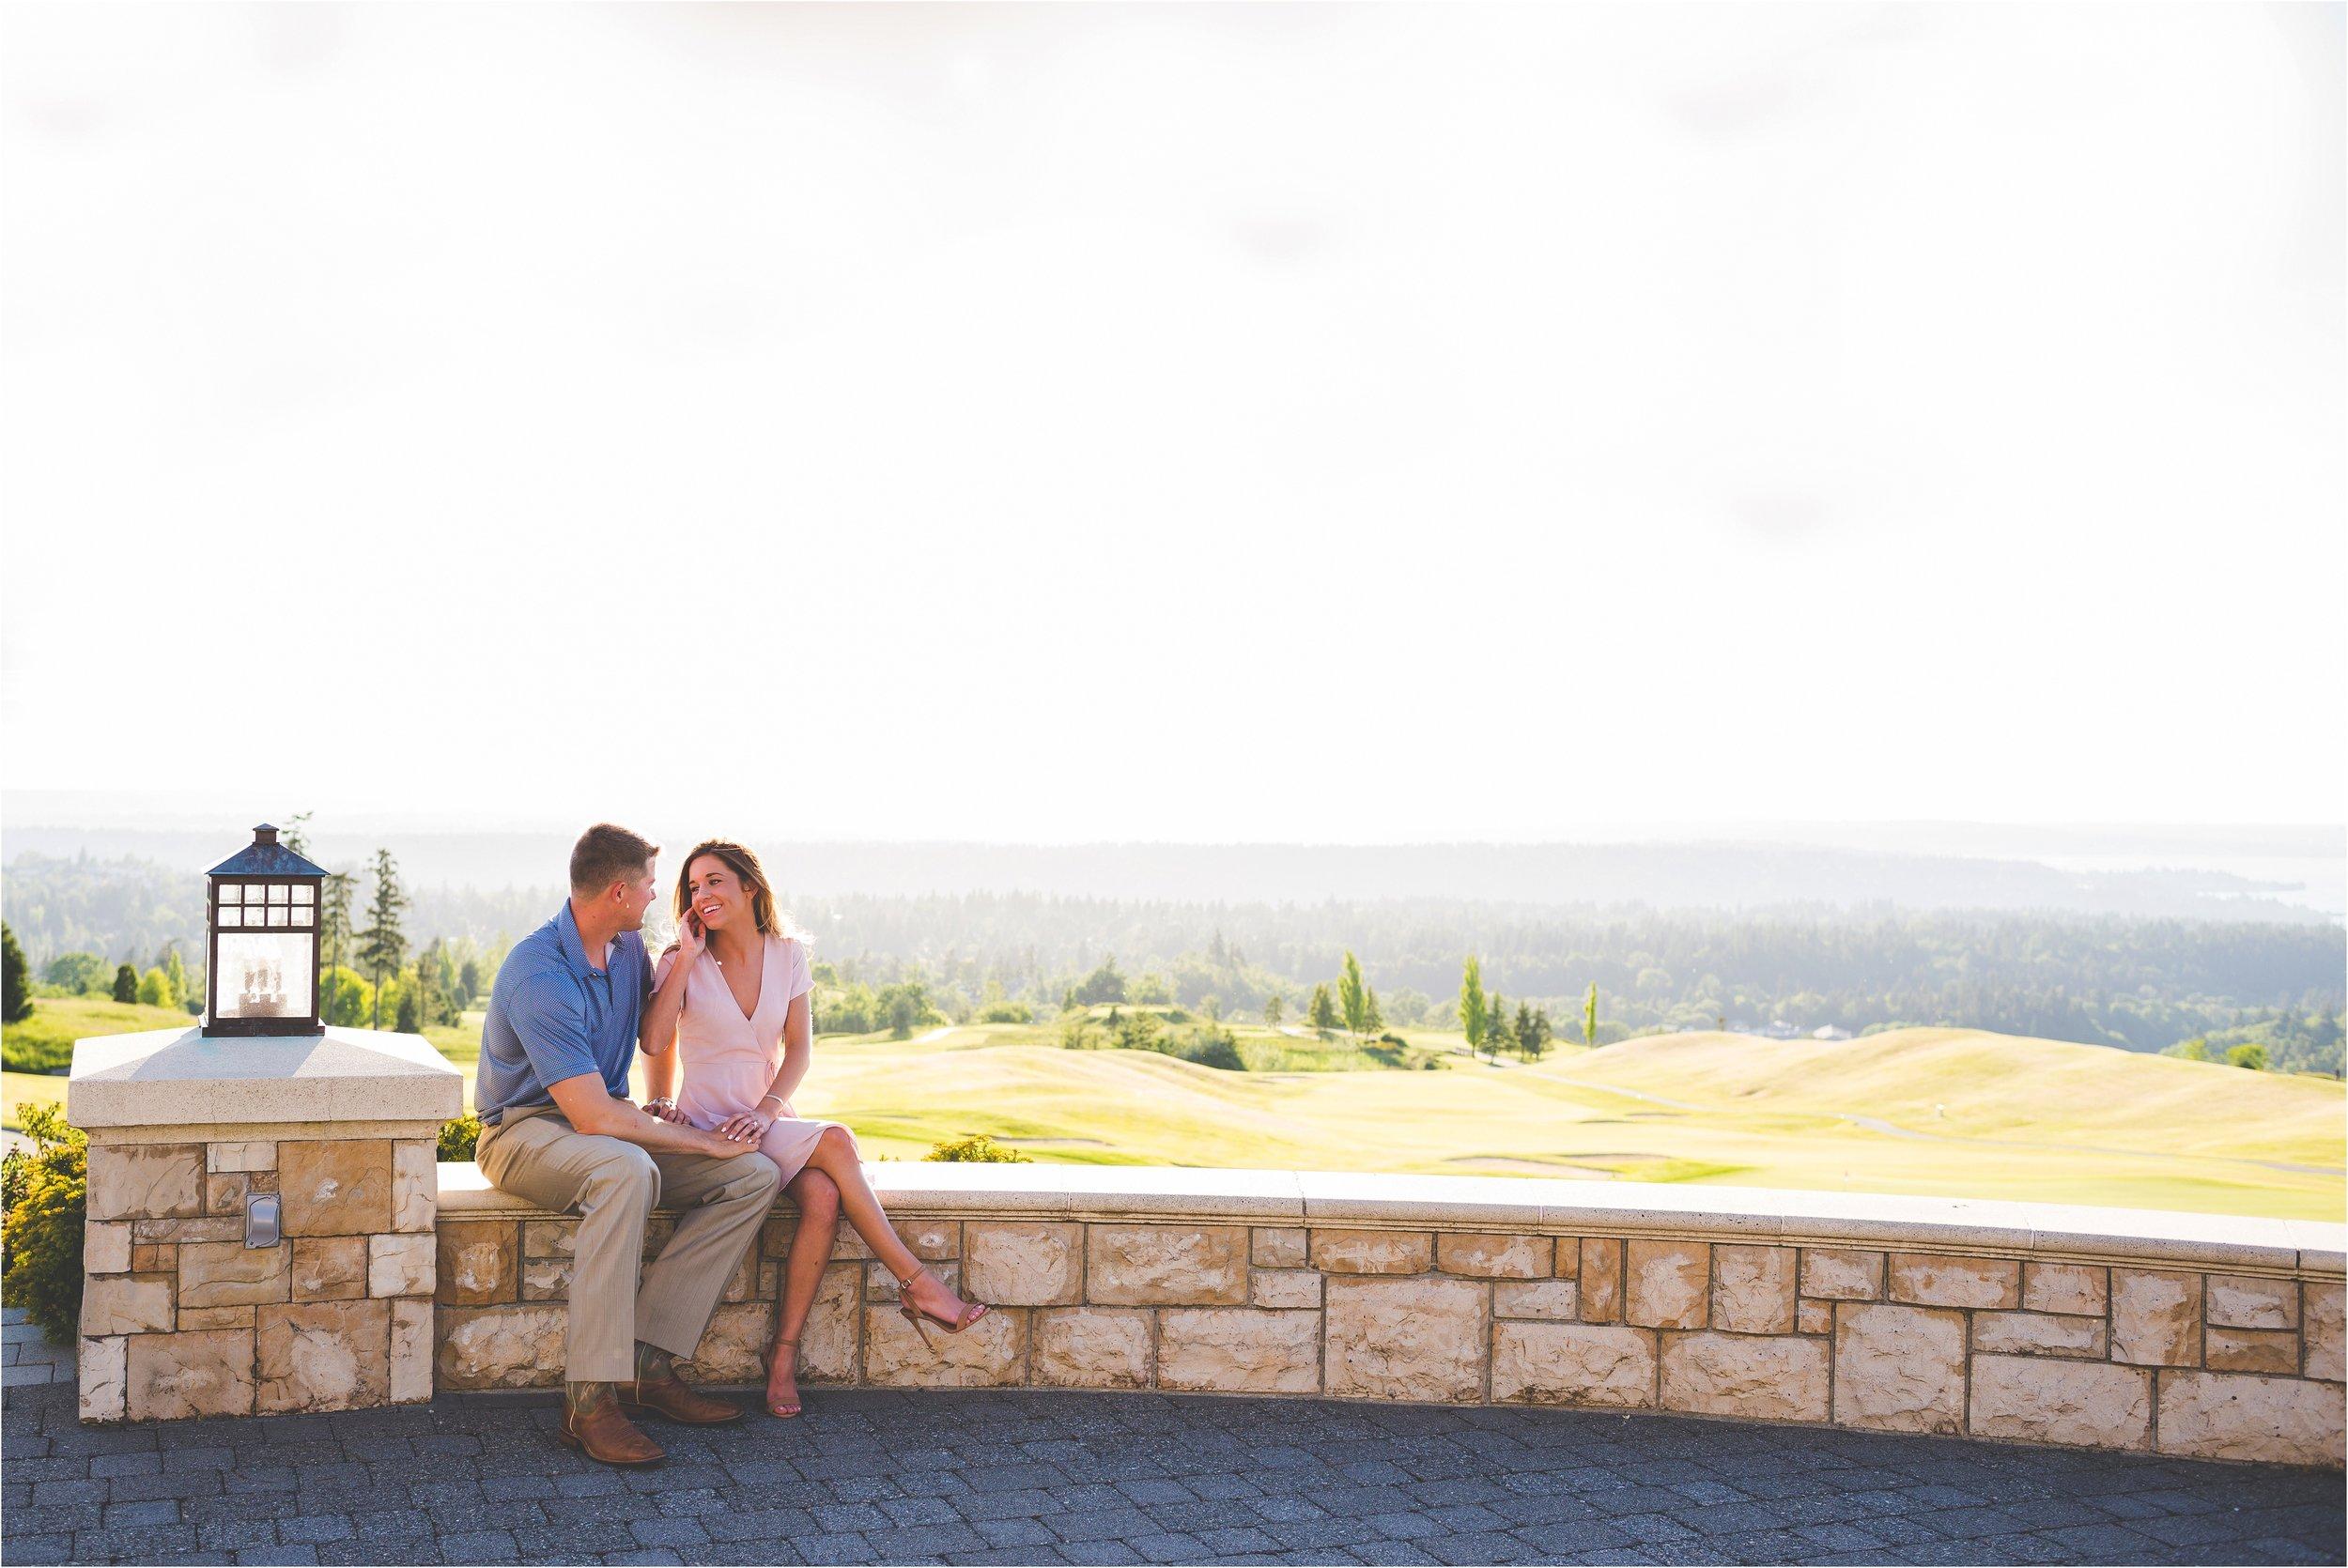 newcastle-golf-club-proposal-jannicka-mayte-seattle-washington-engagement-wedding-photographer_0027.jpg